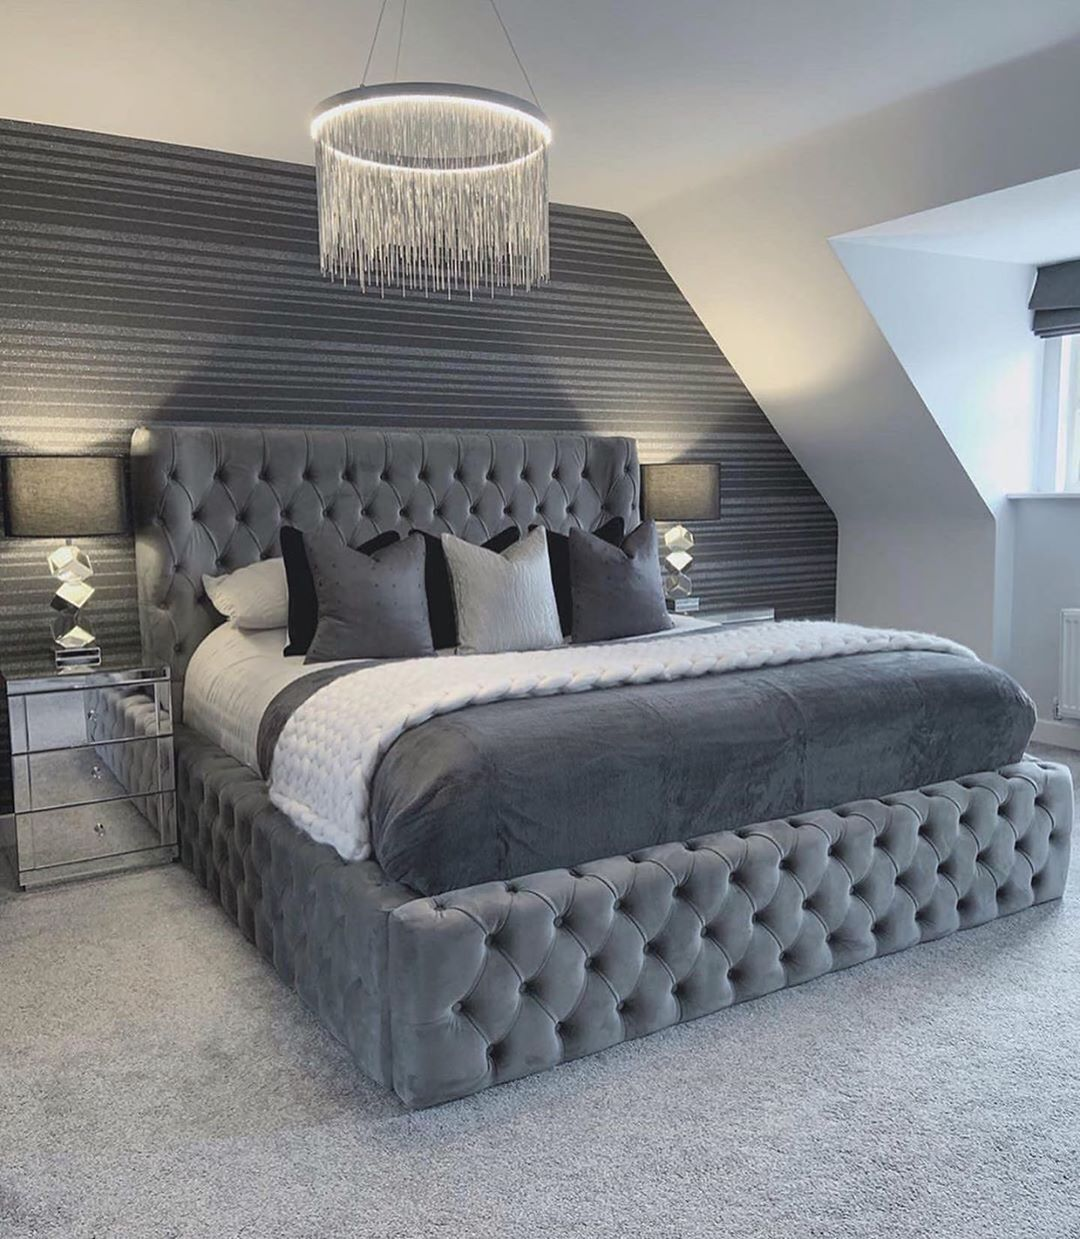 Online Furniture Stores Offering Free Shipping Bedroom Bed Design Luxurious Bedrooms Luxury Bedroom Decor